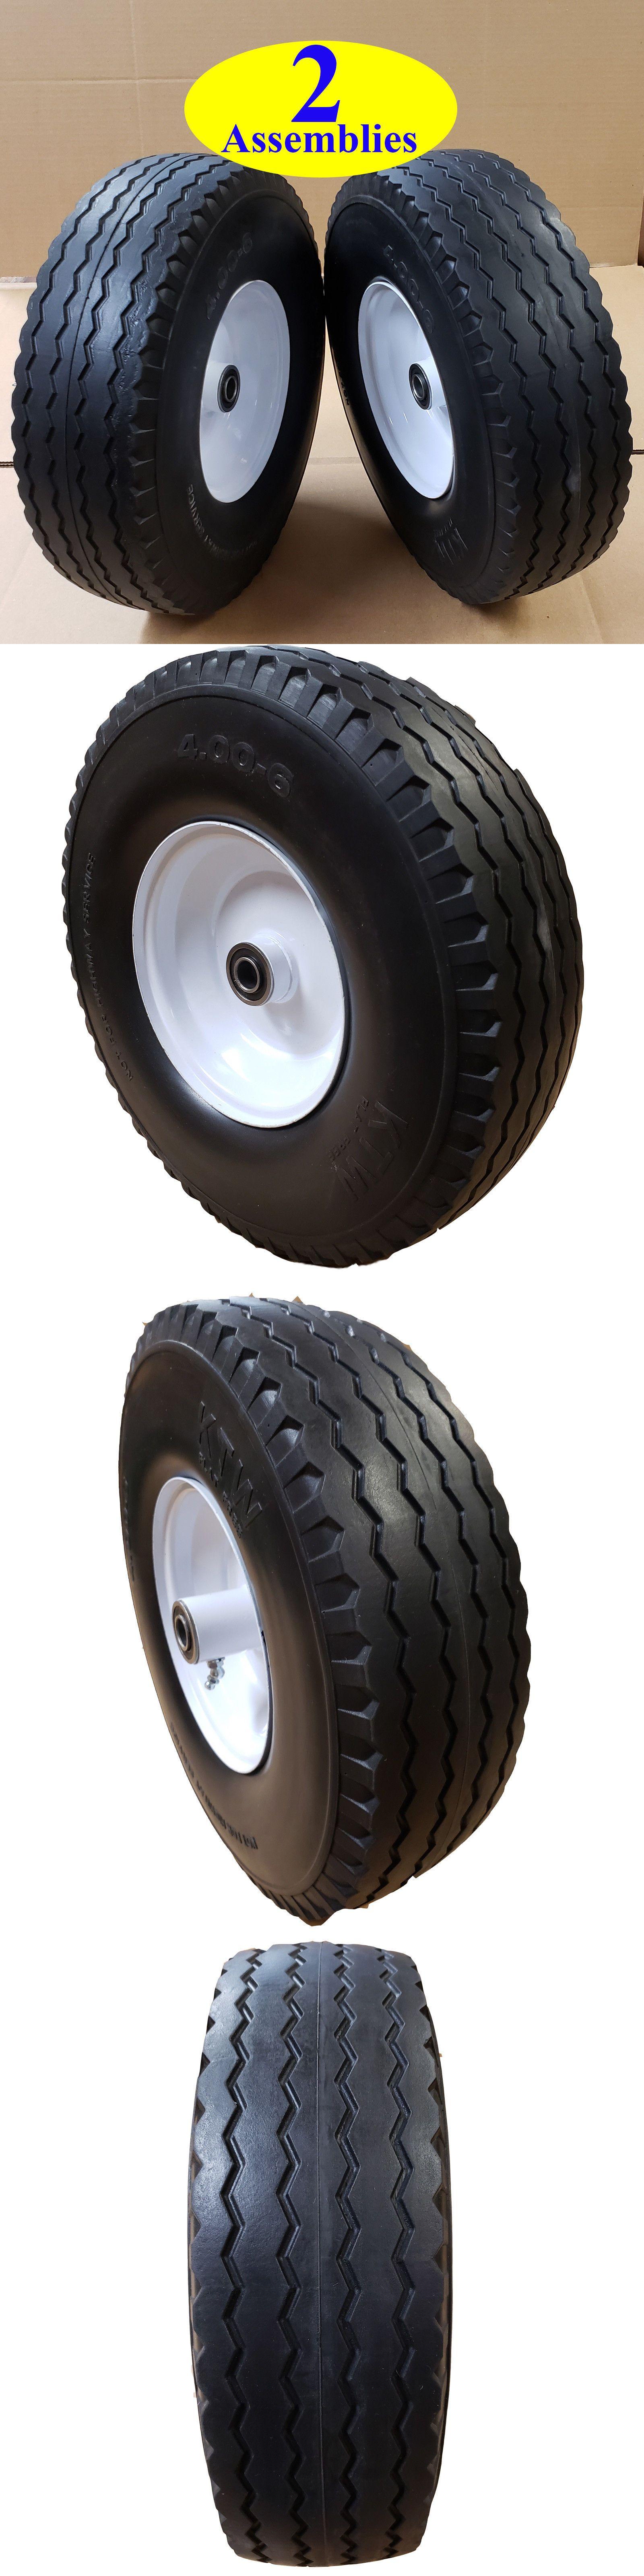 480-8 tire only,no rim Carlisle Wheel Barrow Wheelbarrow Tire